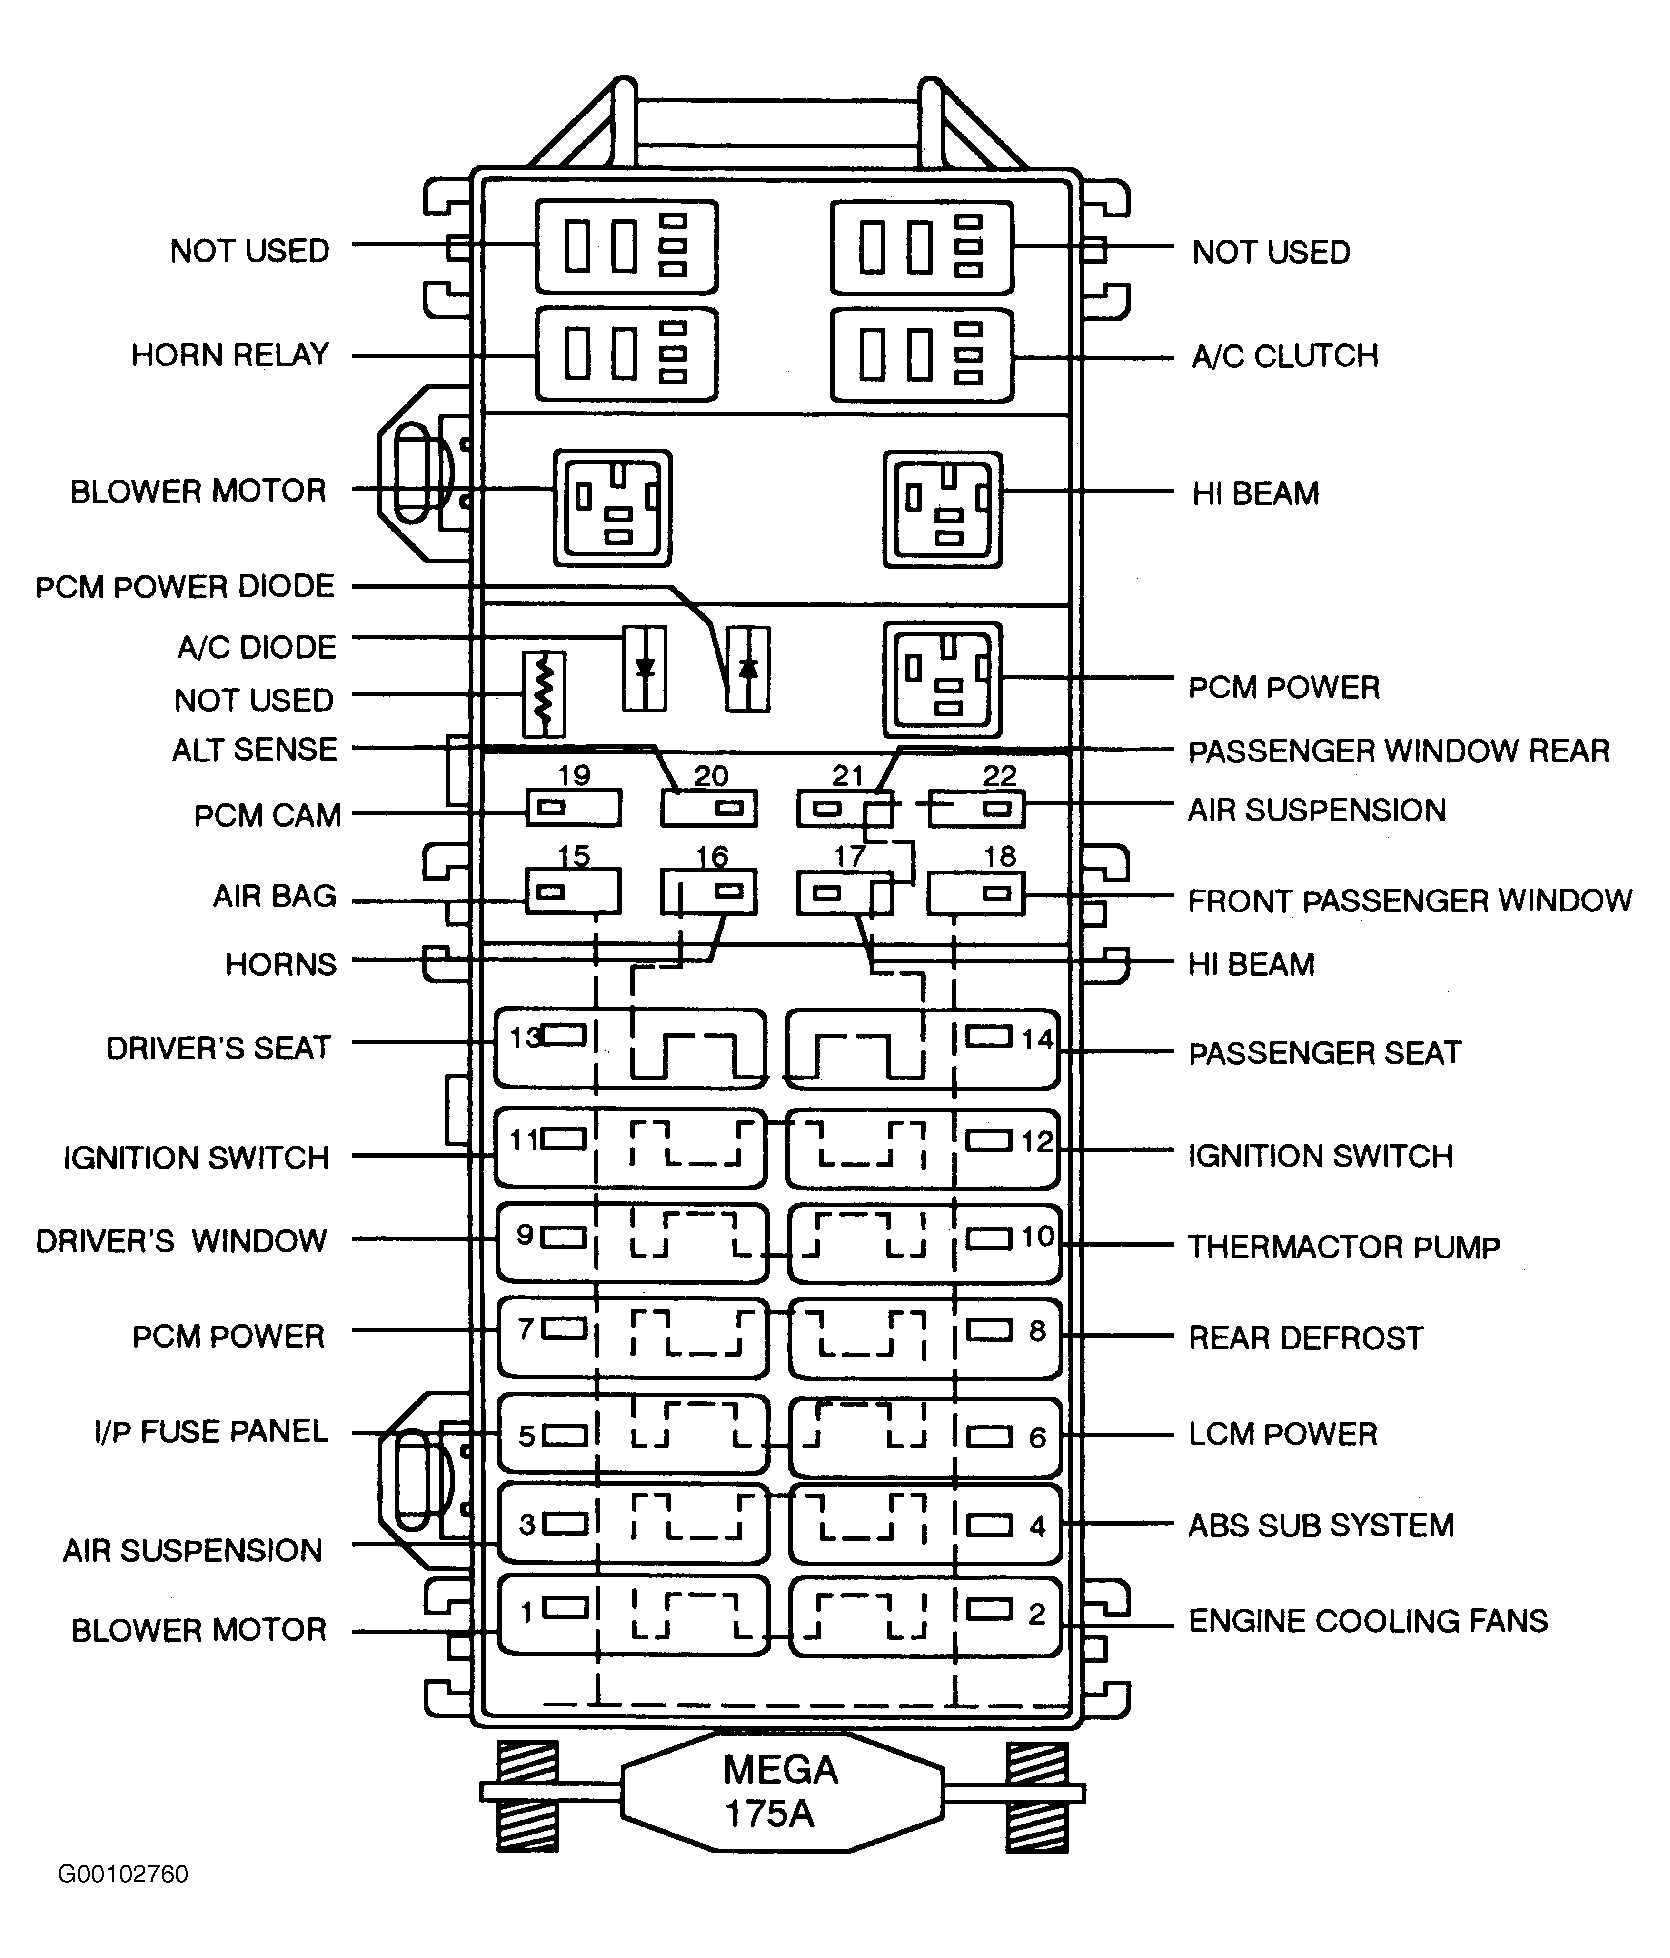 Car Fuse Diagram Automobile Box 91 Town Simple Wiring Rh David Huggett Co Uk 2001 Lincoln